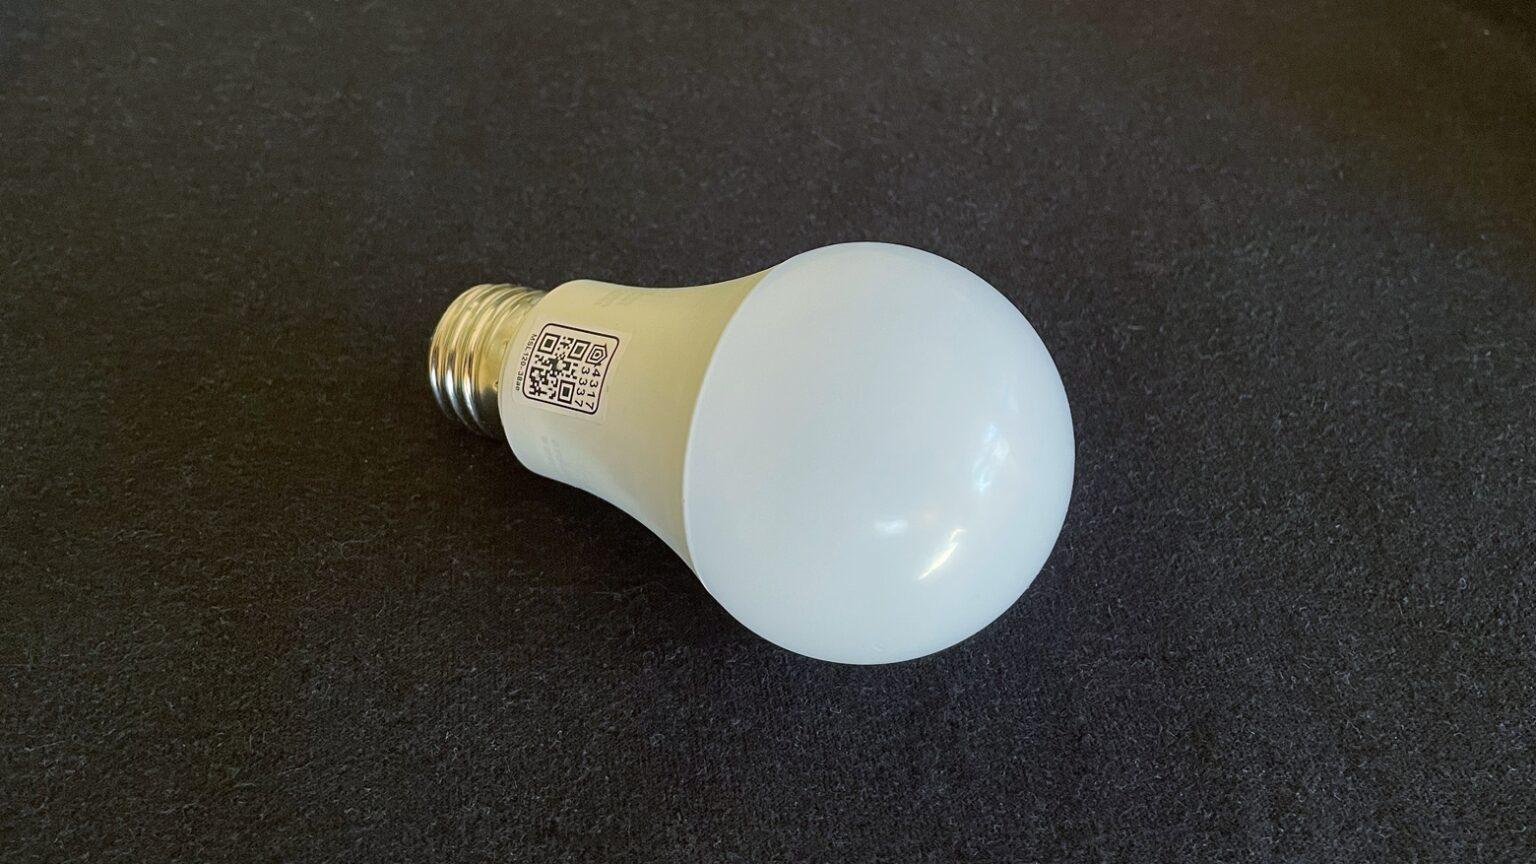 Meross Smart WiFi LED Bulb review